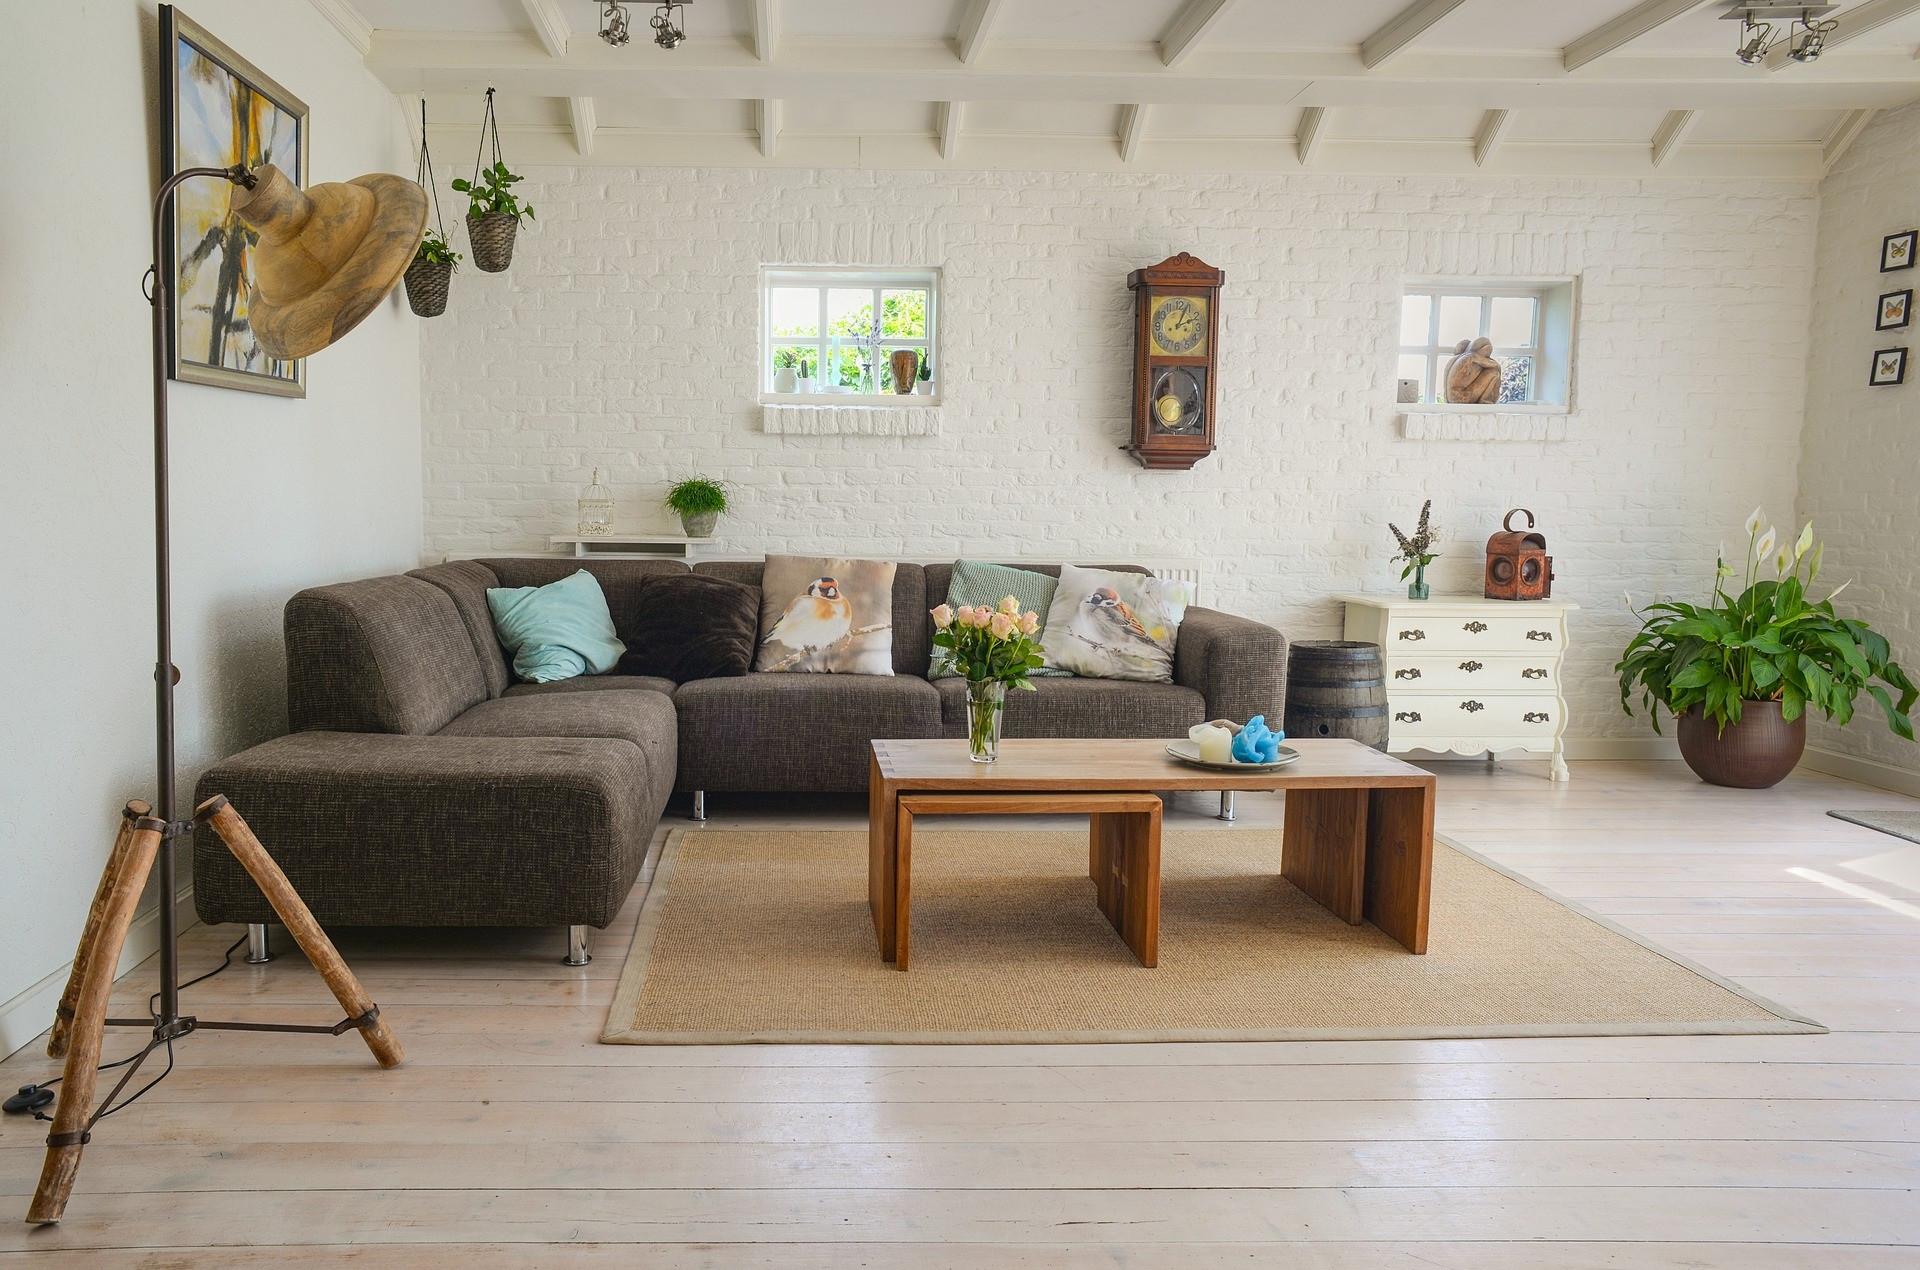 Rinnovare Pareti Di Casa come rinnovare casa spendendo poco — idealista/news